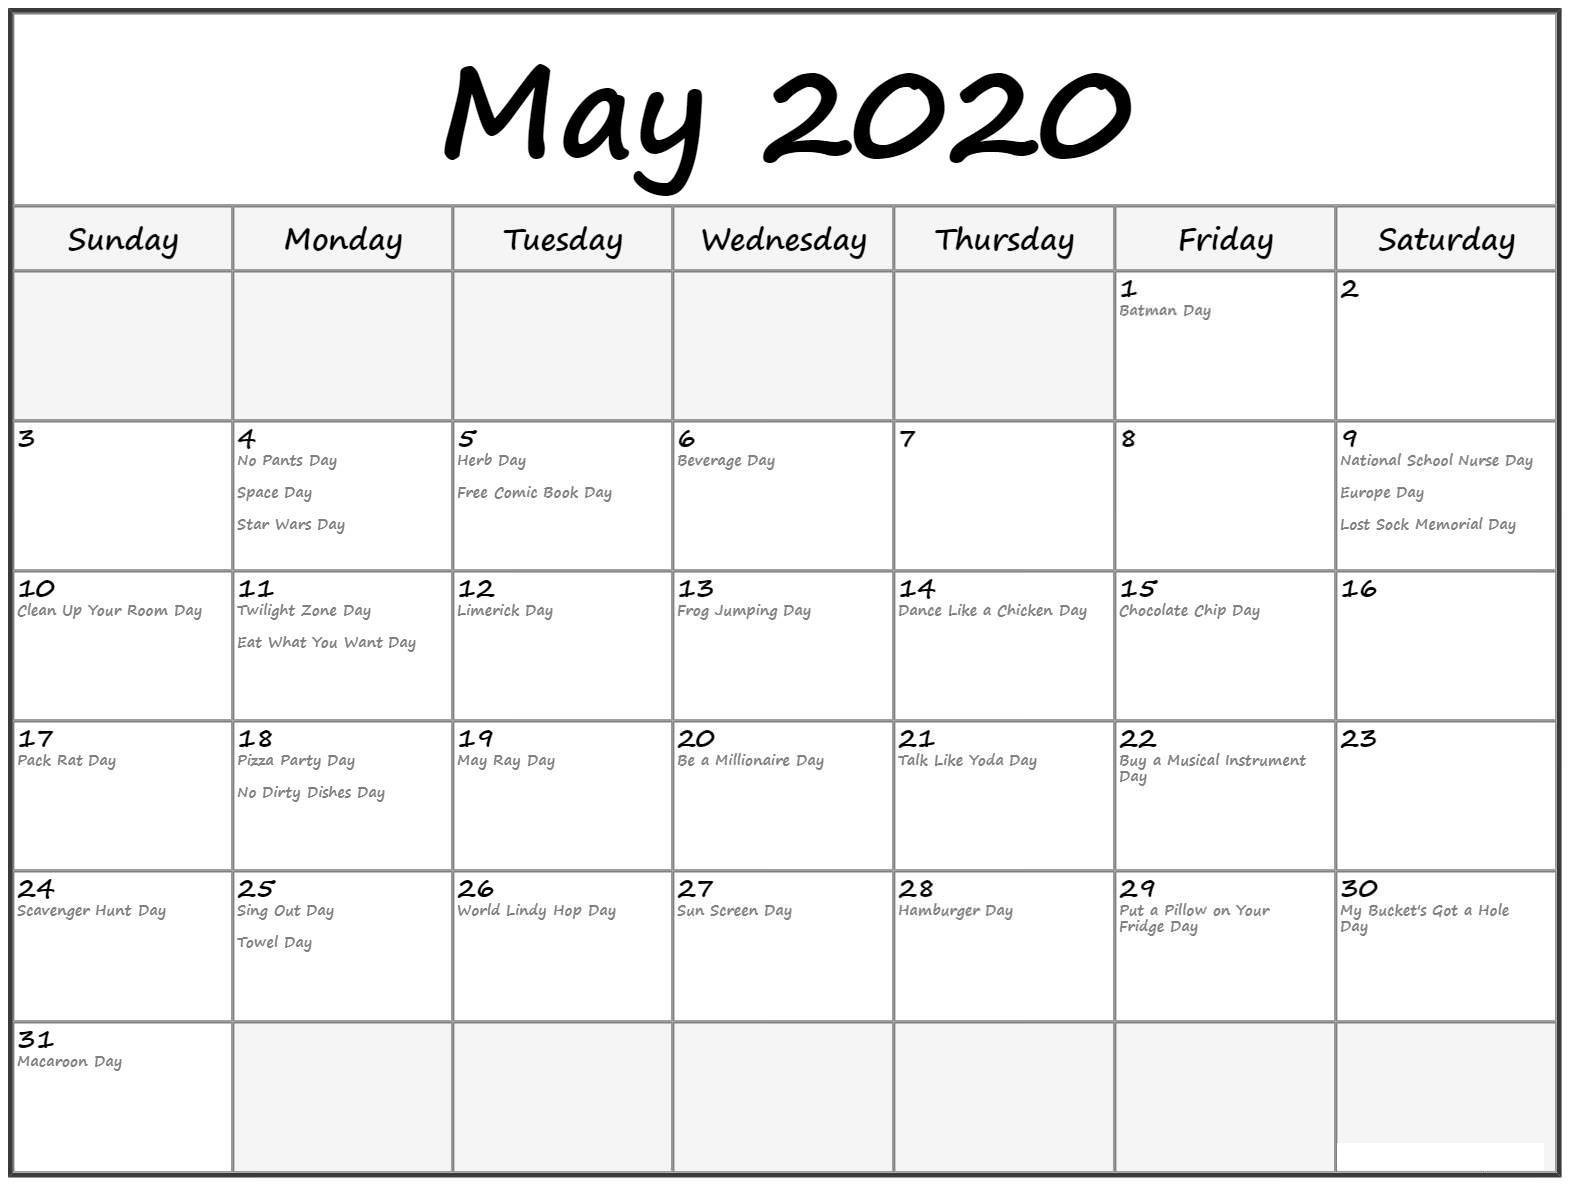 May 2020 Calendar With Holidays Sheet